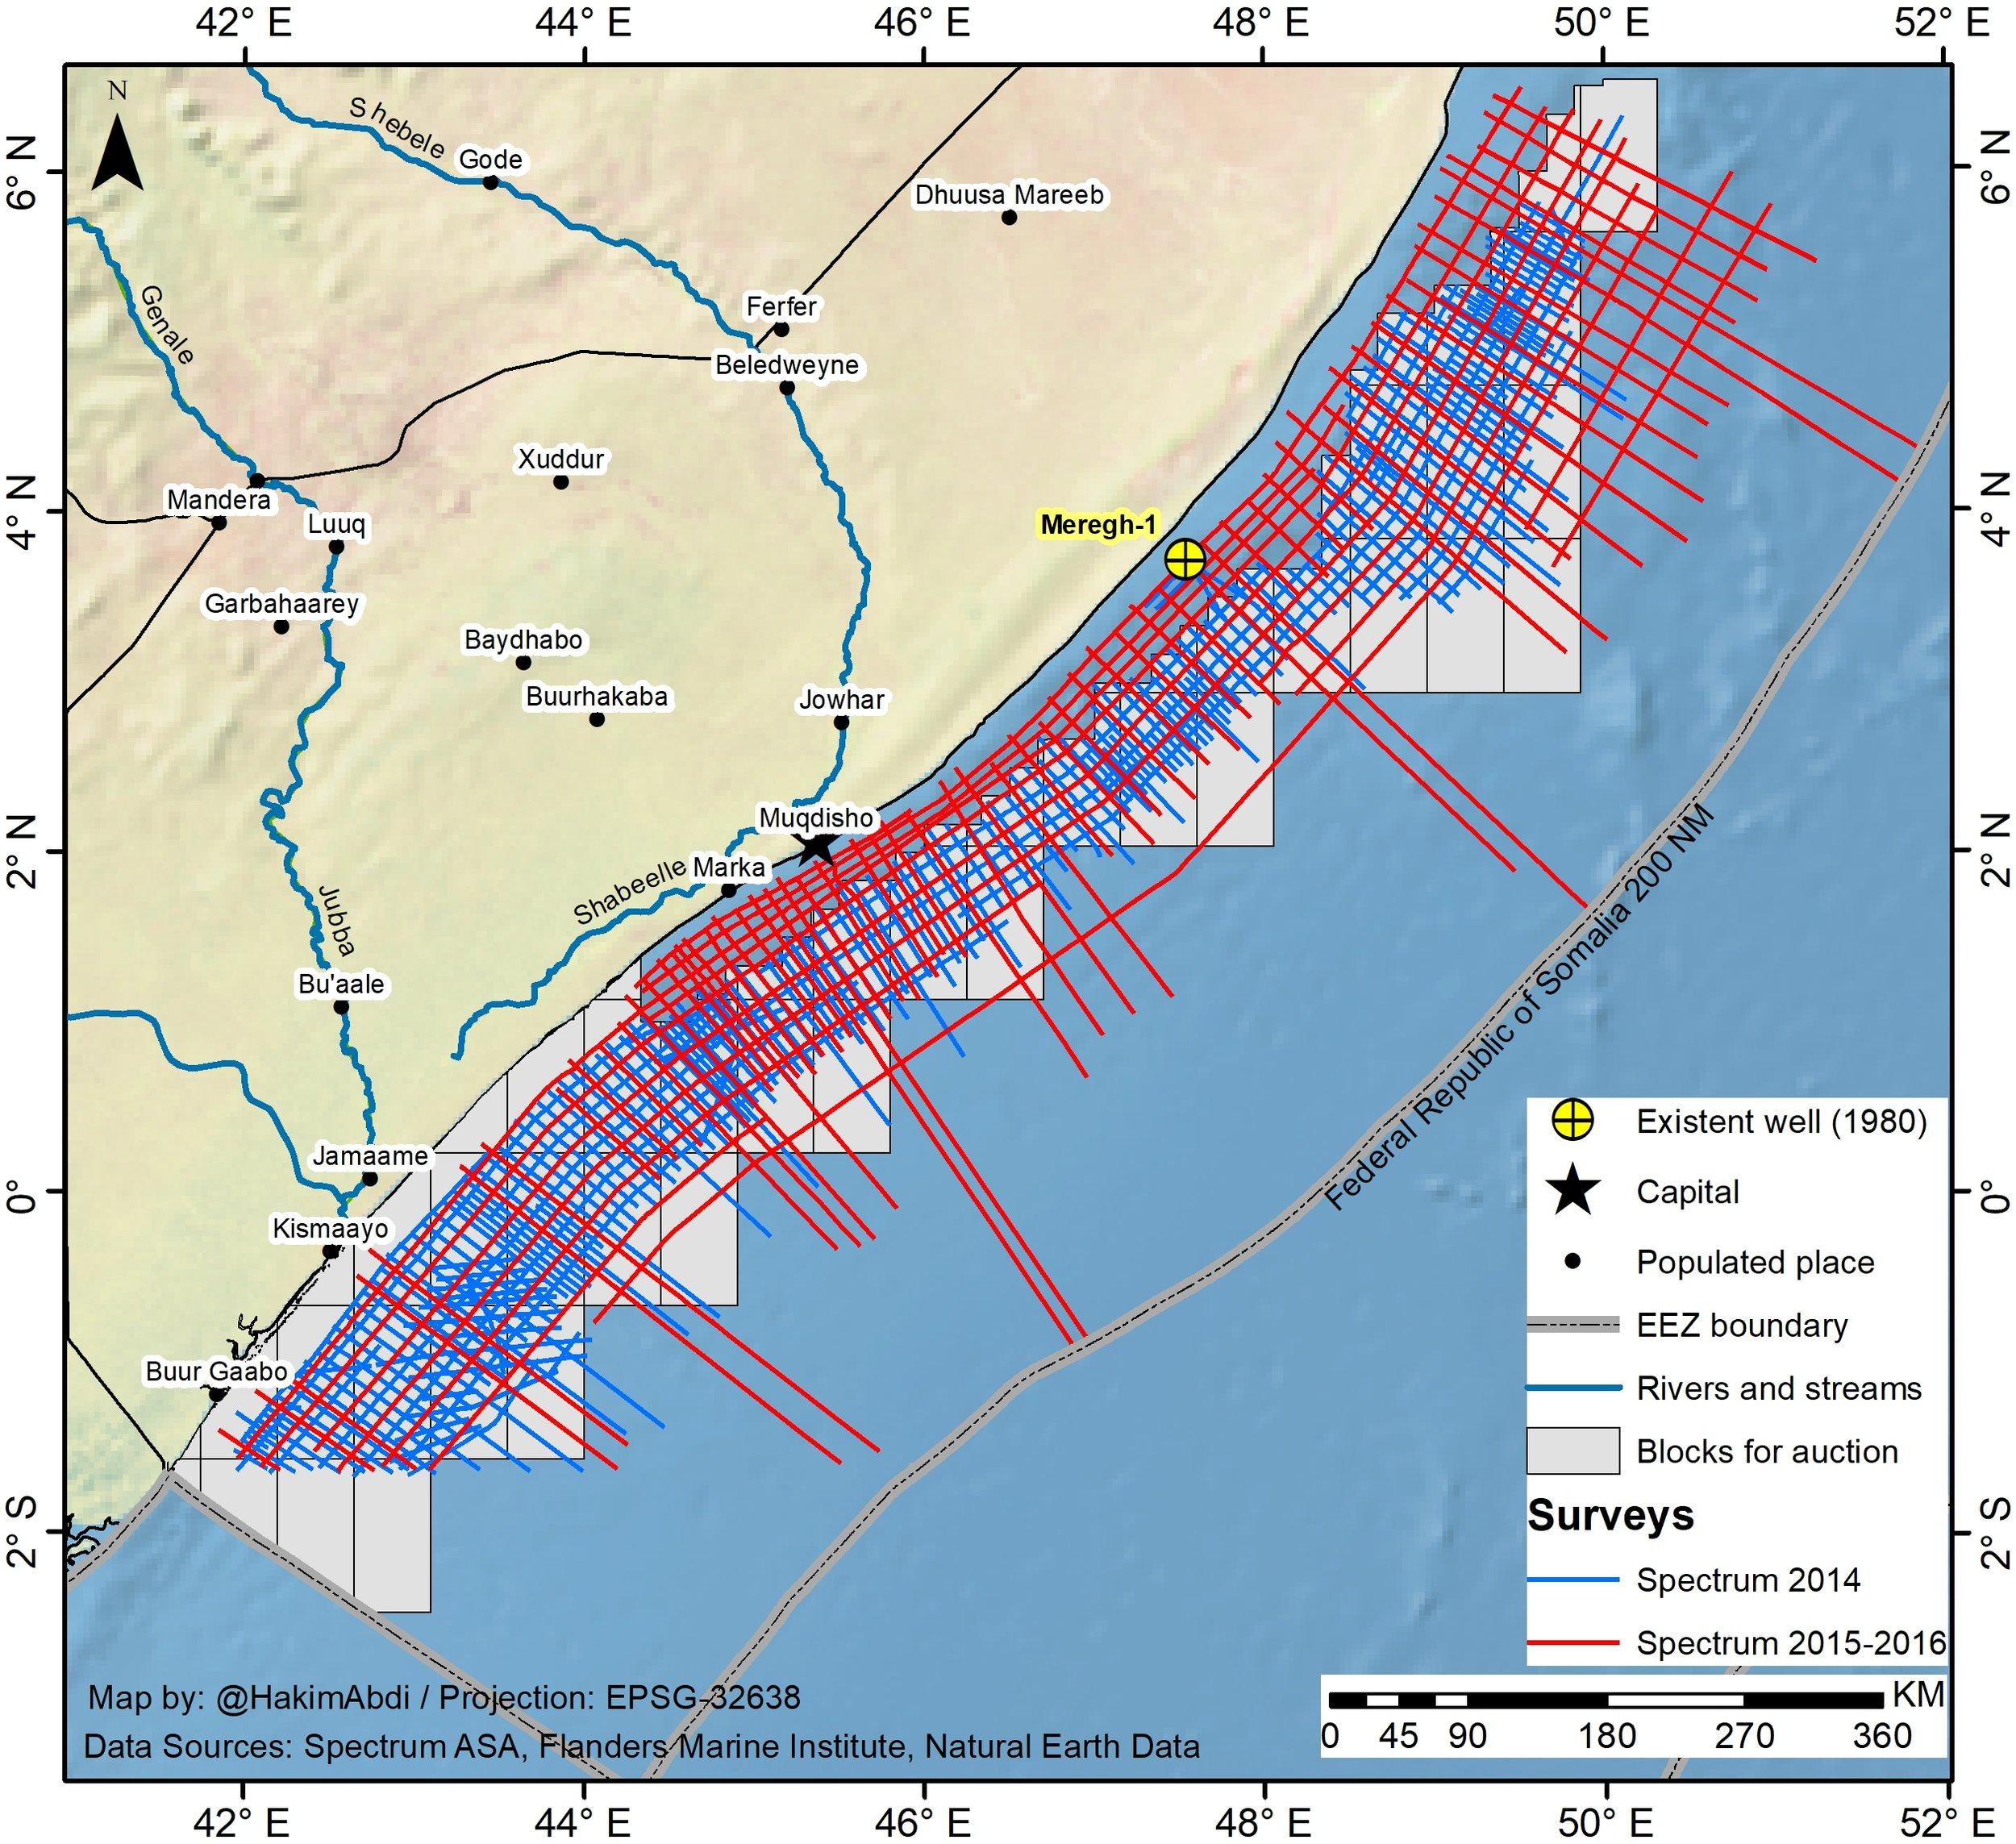 Somalia_Oil_Blocks_Map.jpg